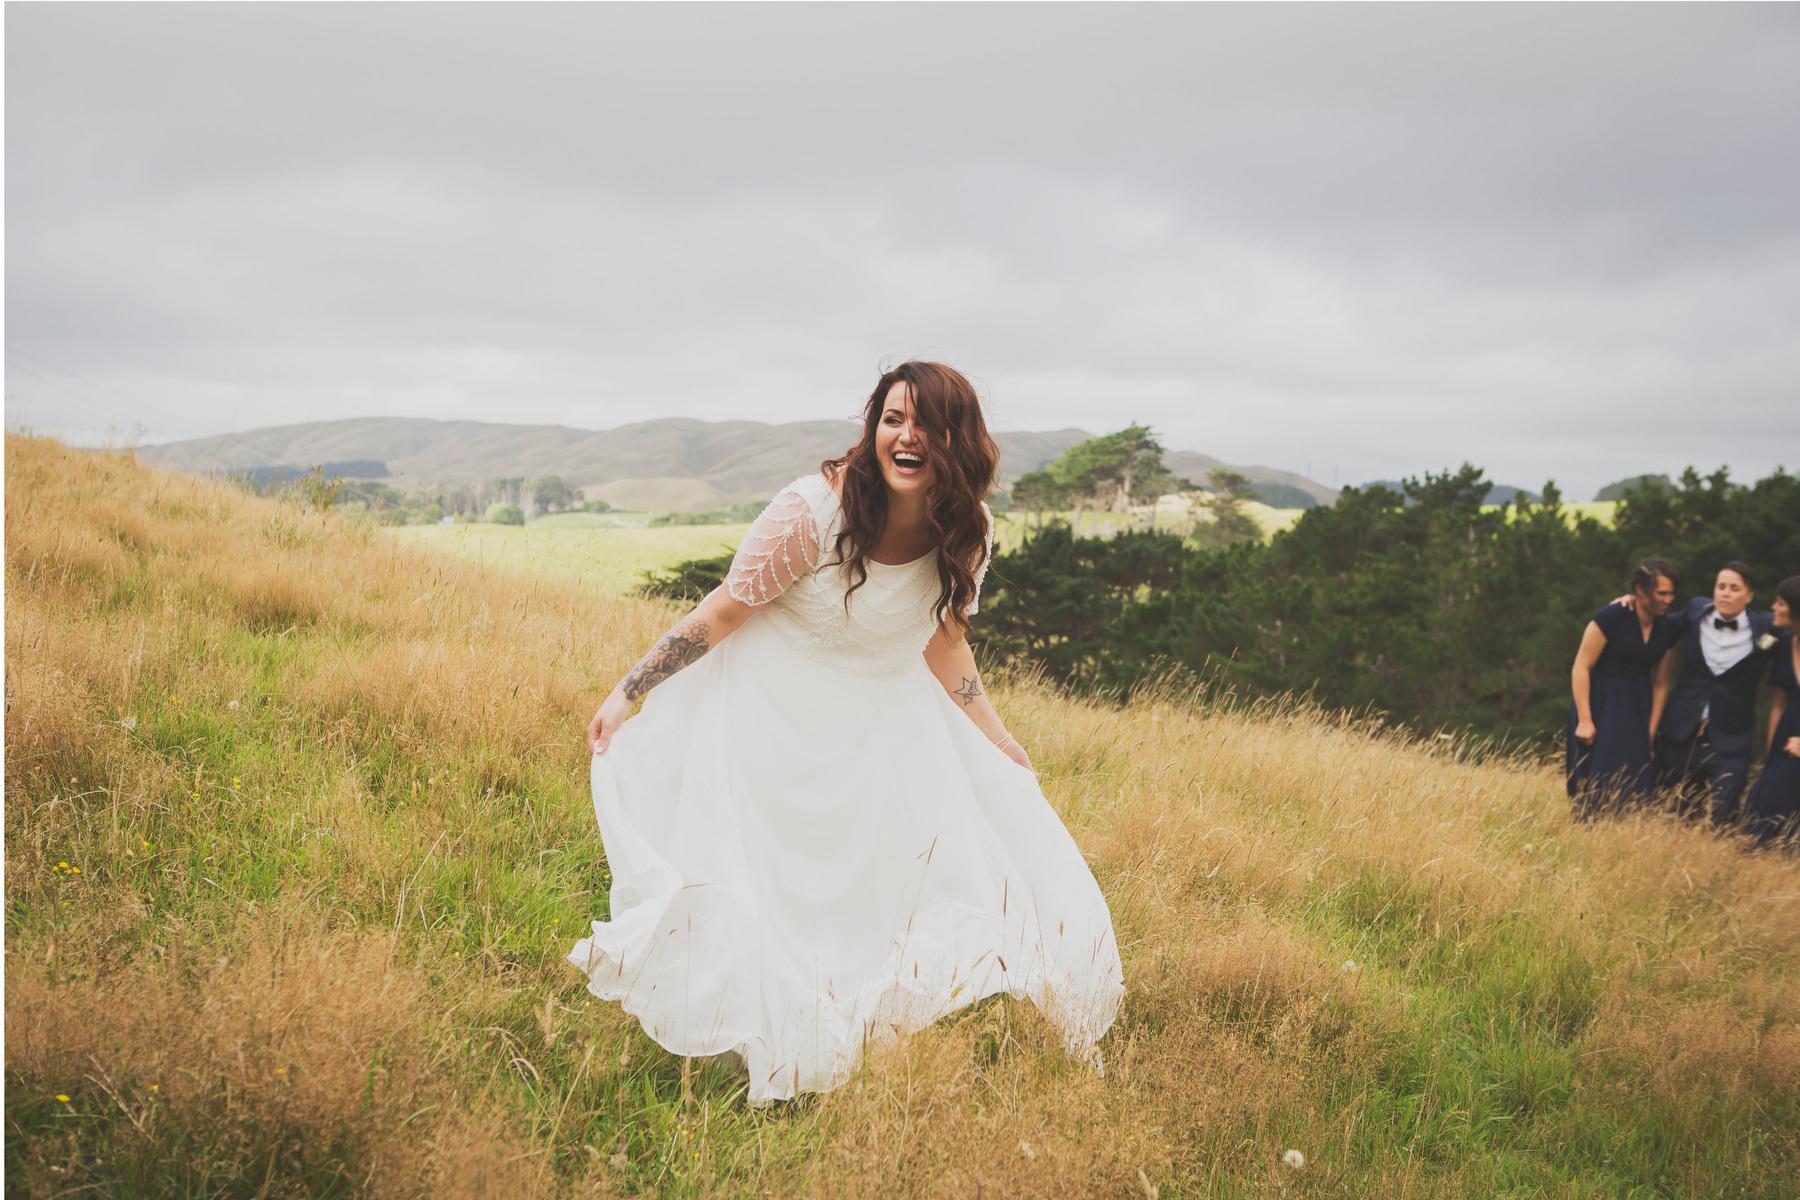 wedding-photogrpaher-kapiti-michelle-13A.JPG